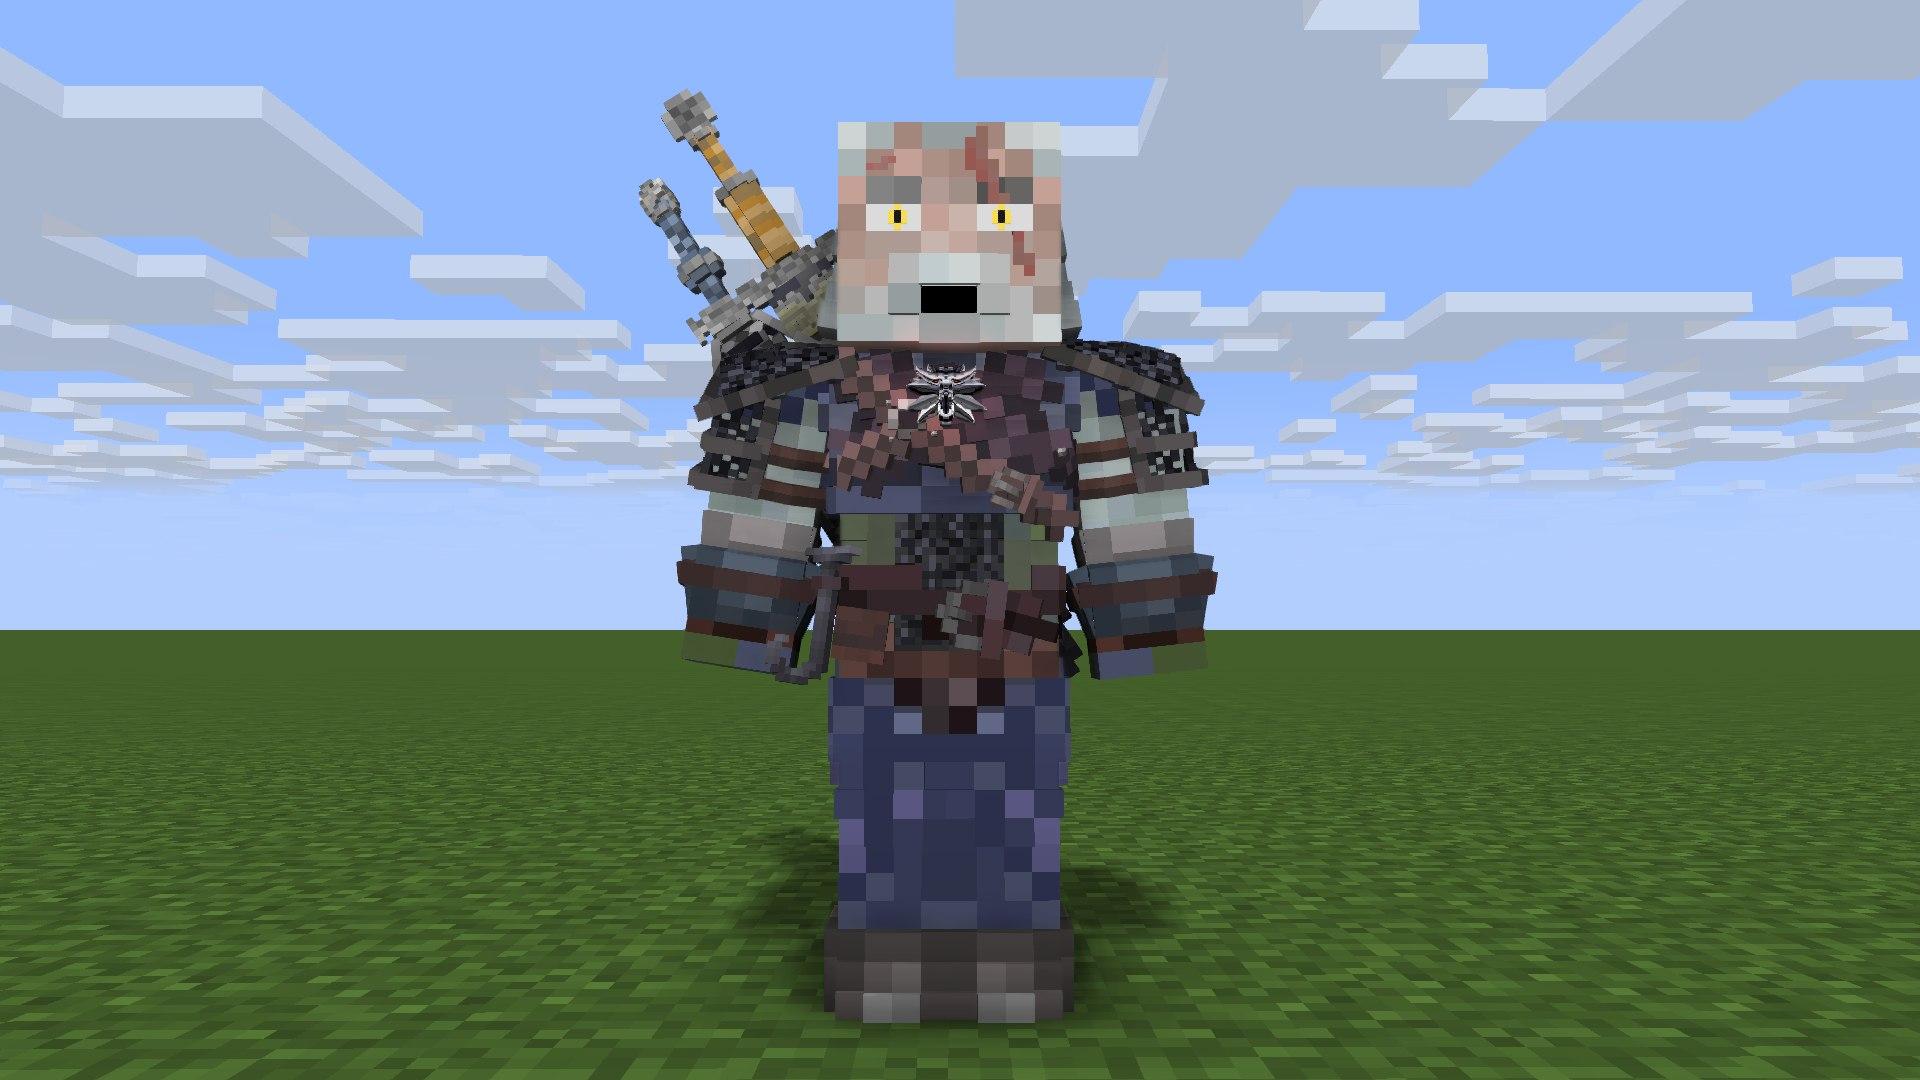 The Witcher - Geralt of Rivia - Random/Test animations - Mine